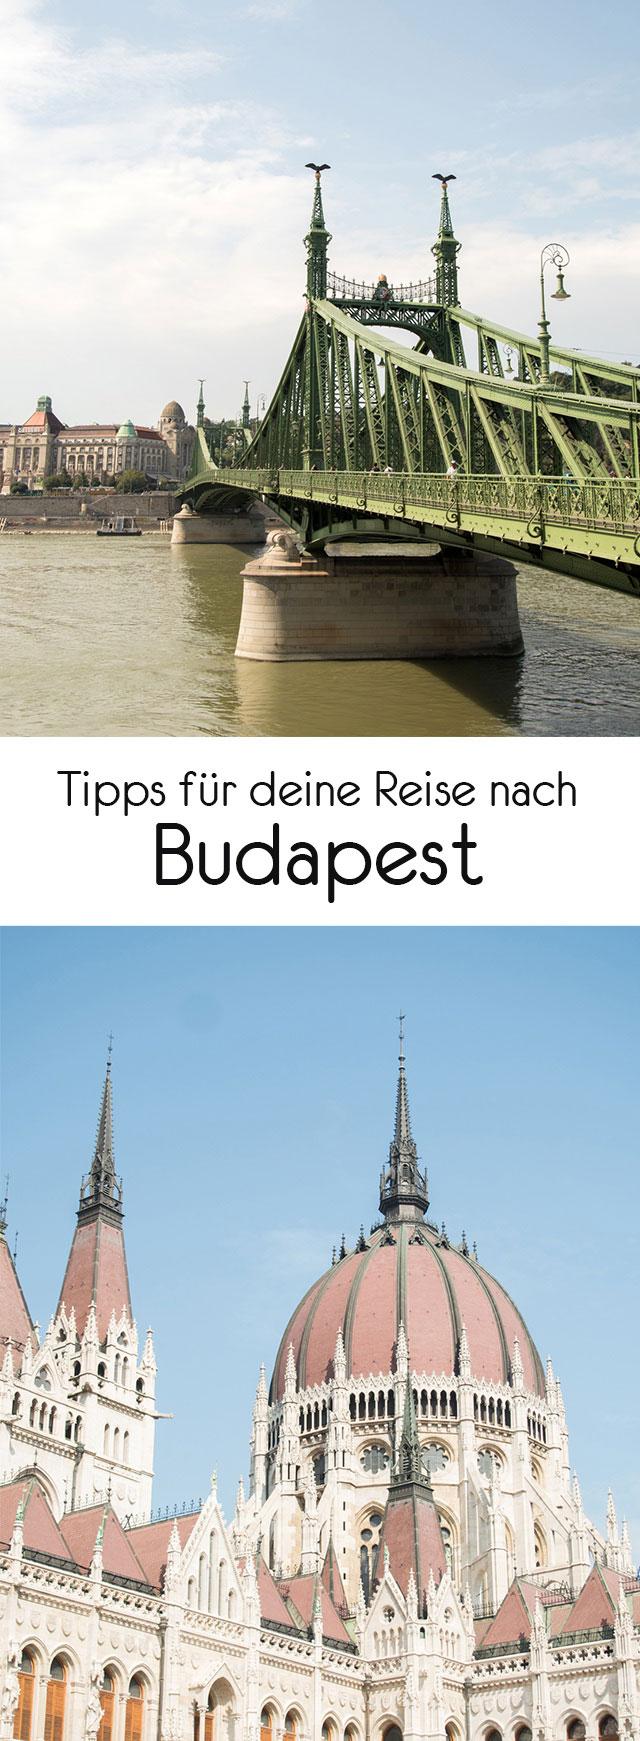 budapest tipps pinterest - Budapest